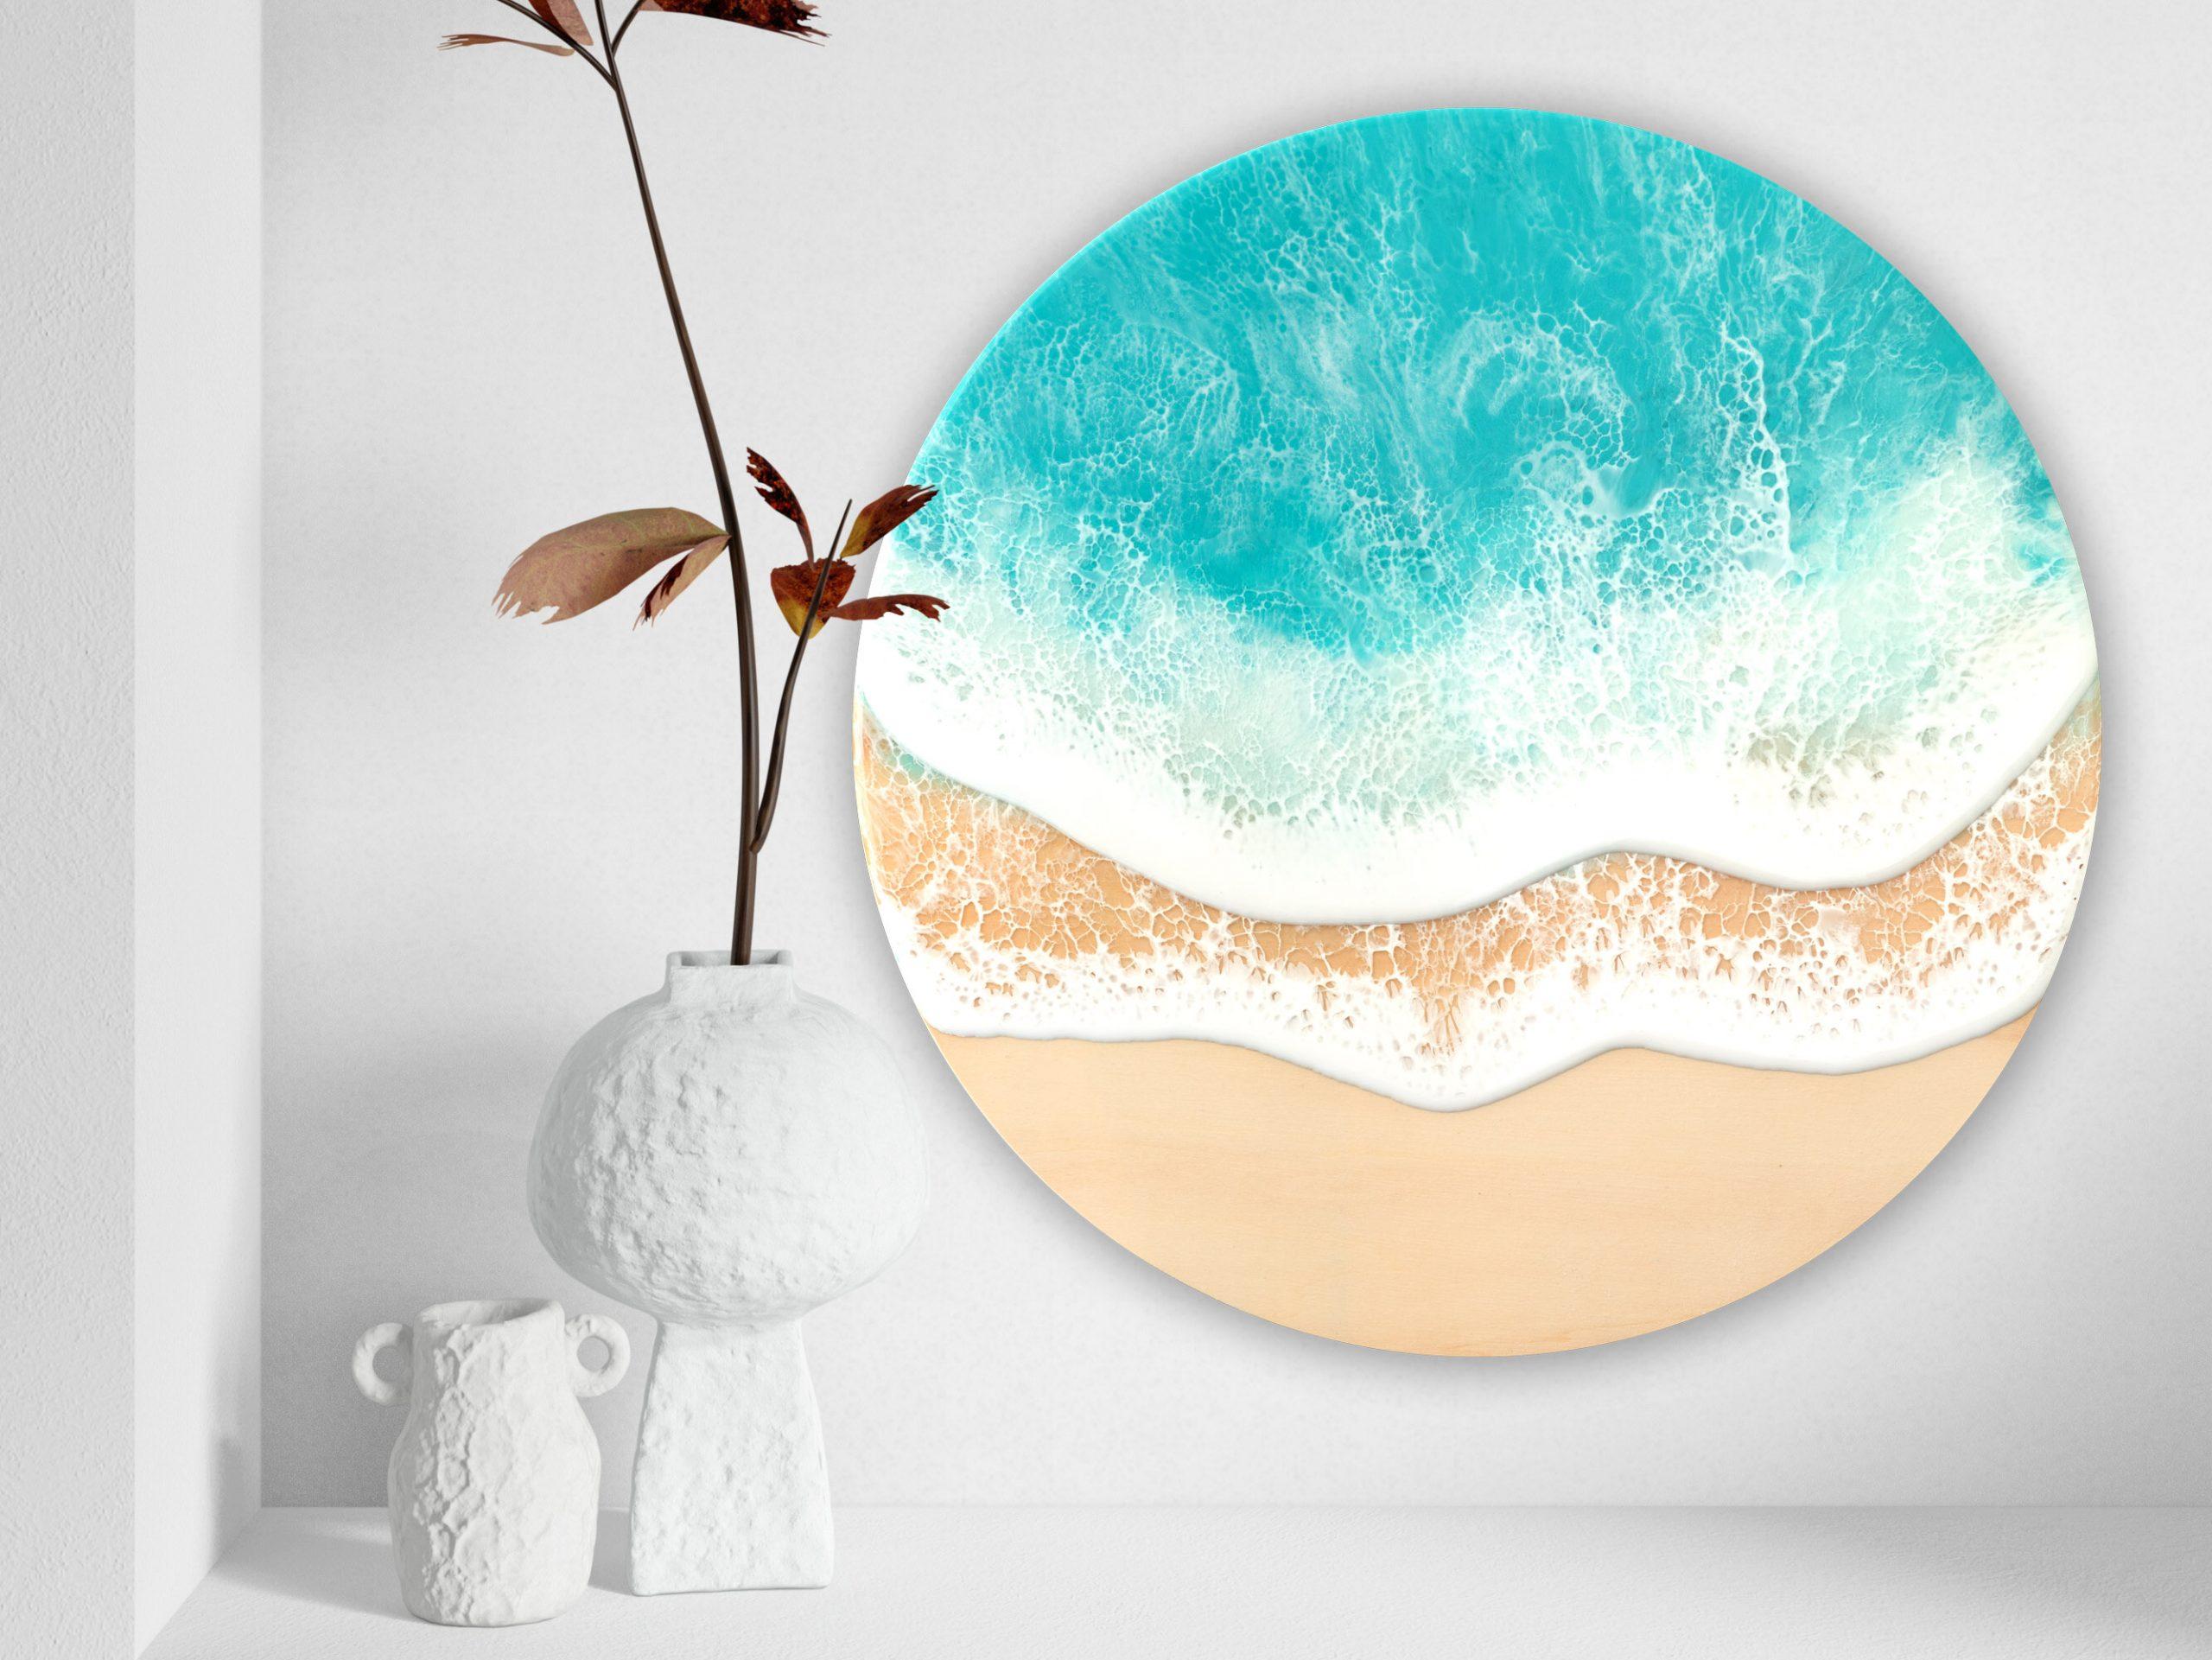 Australian Beach Wave Art Resin Art Finding Bliss By Michelle Tracey